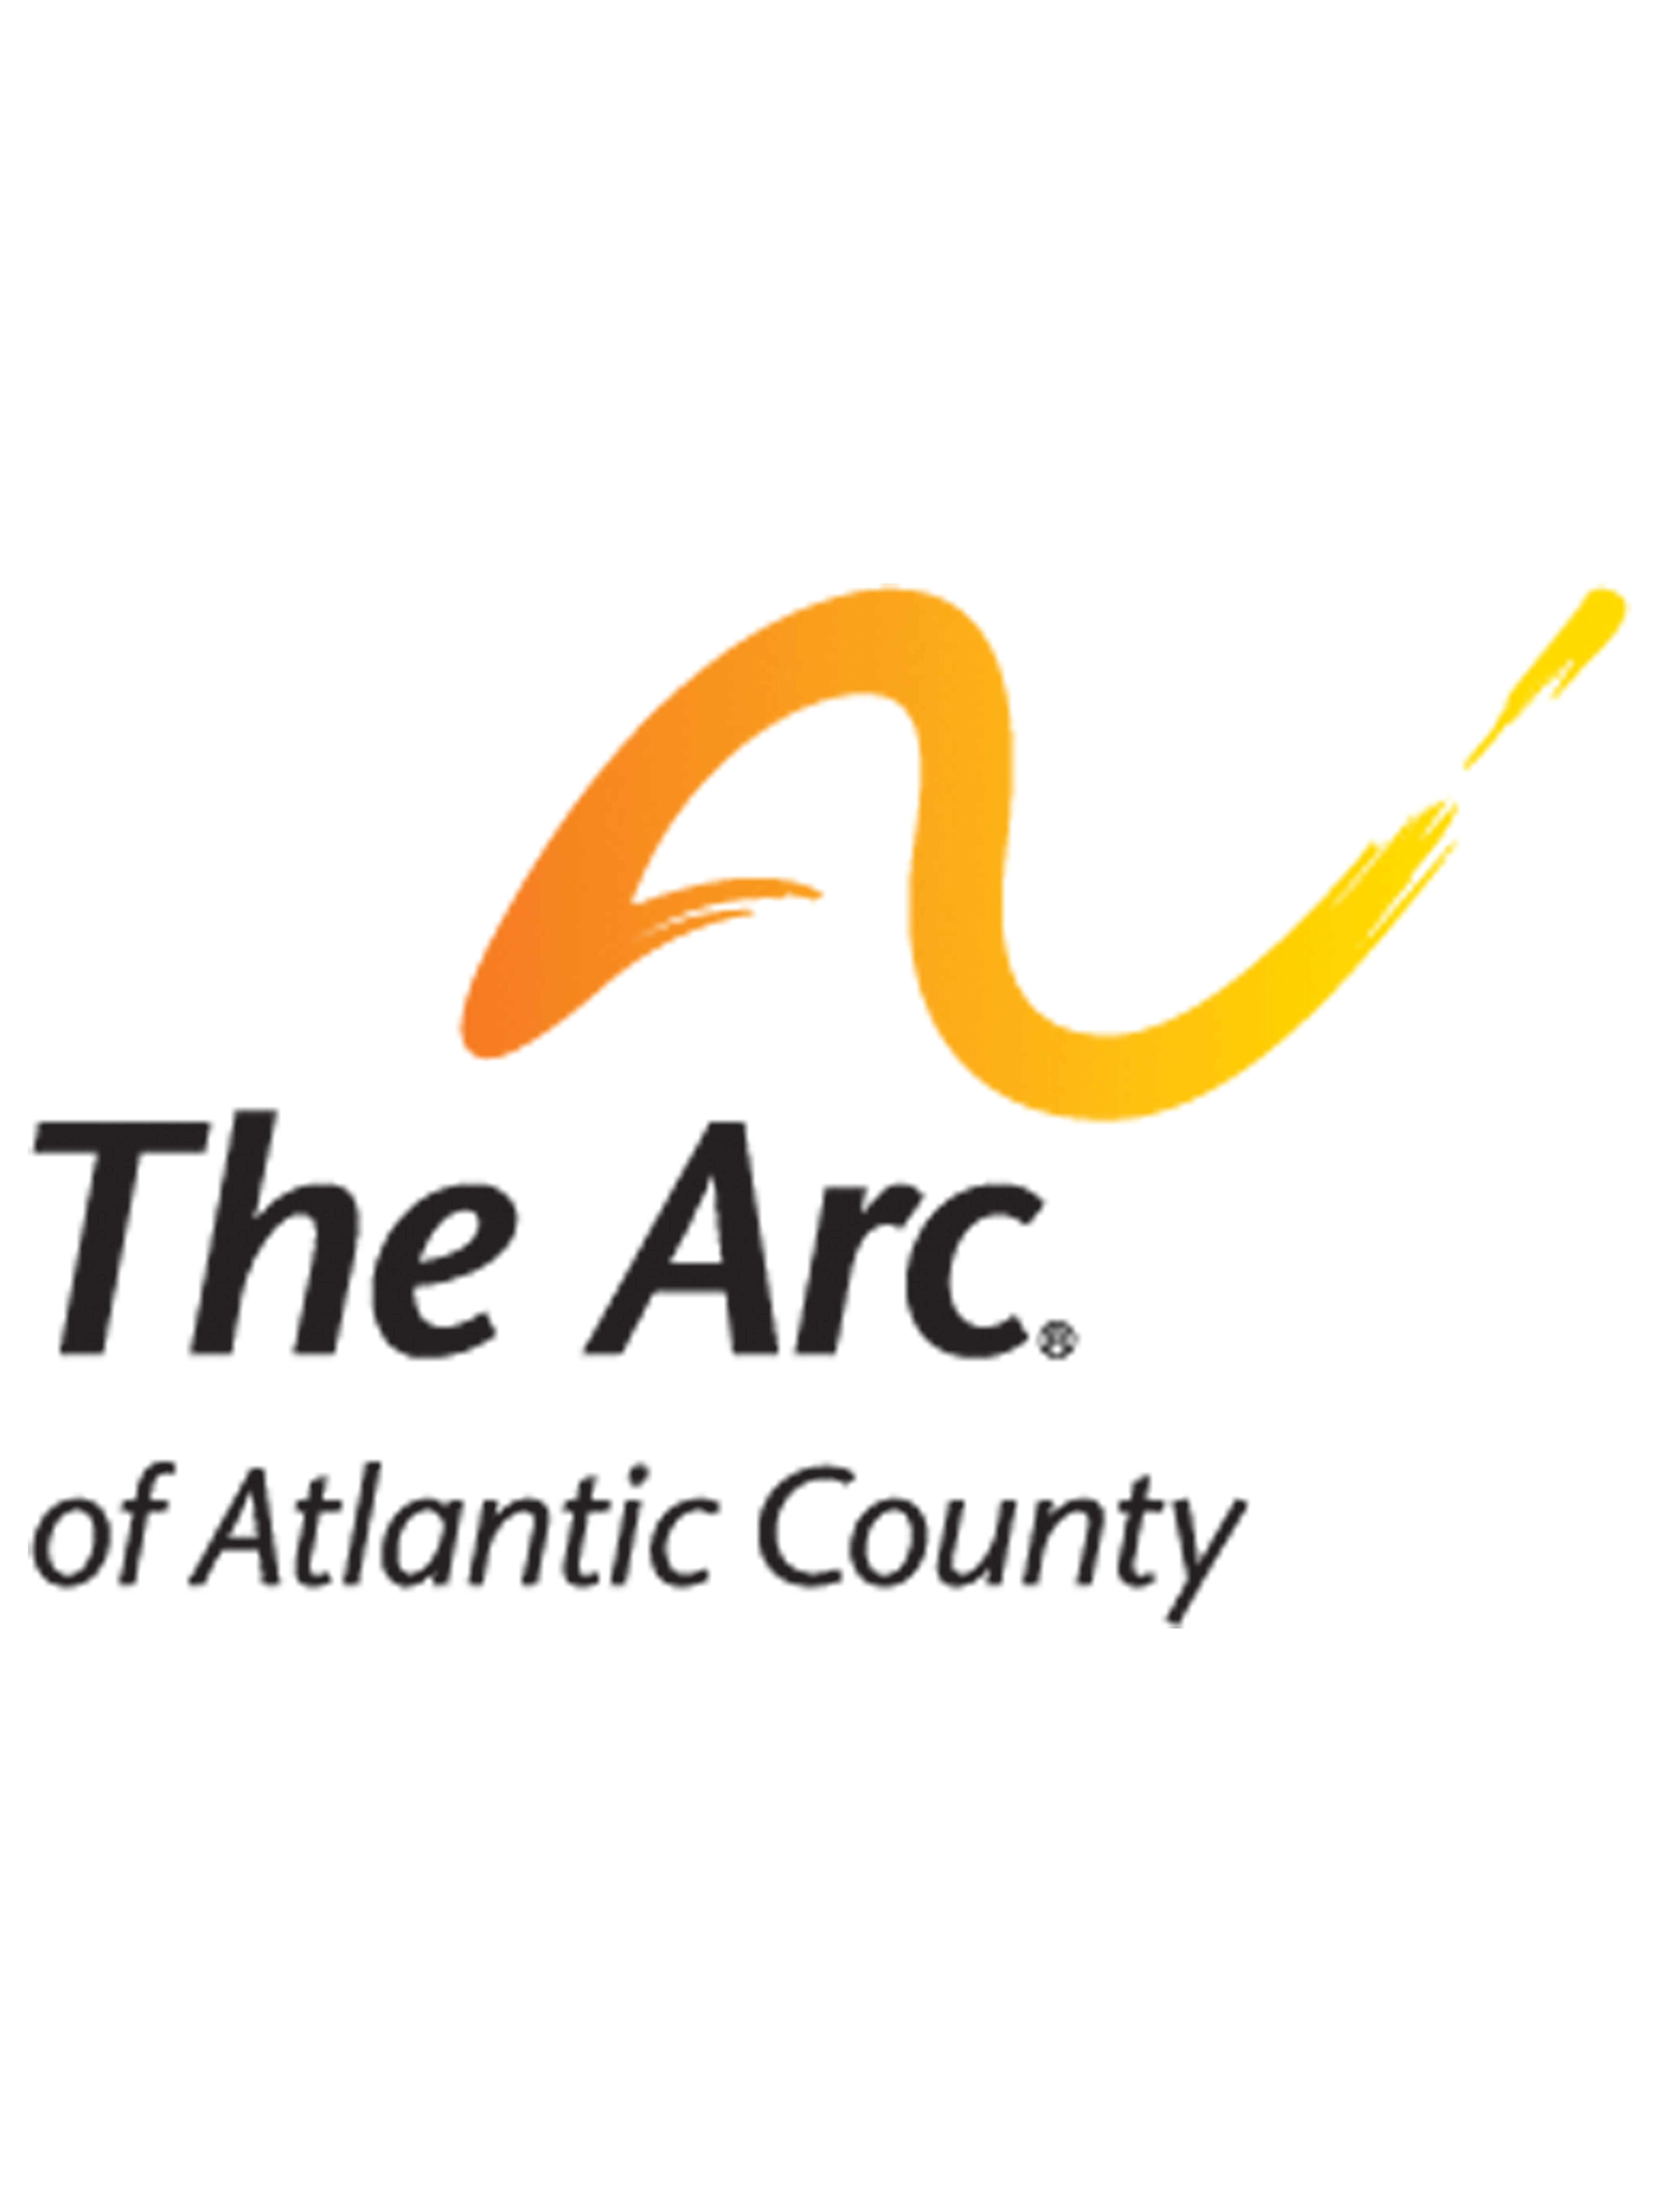 The Arc of Atlantic County